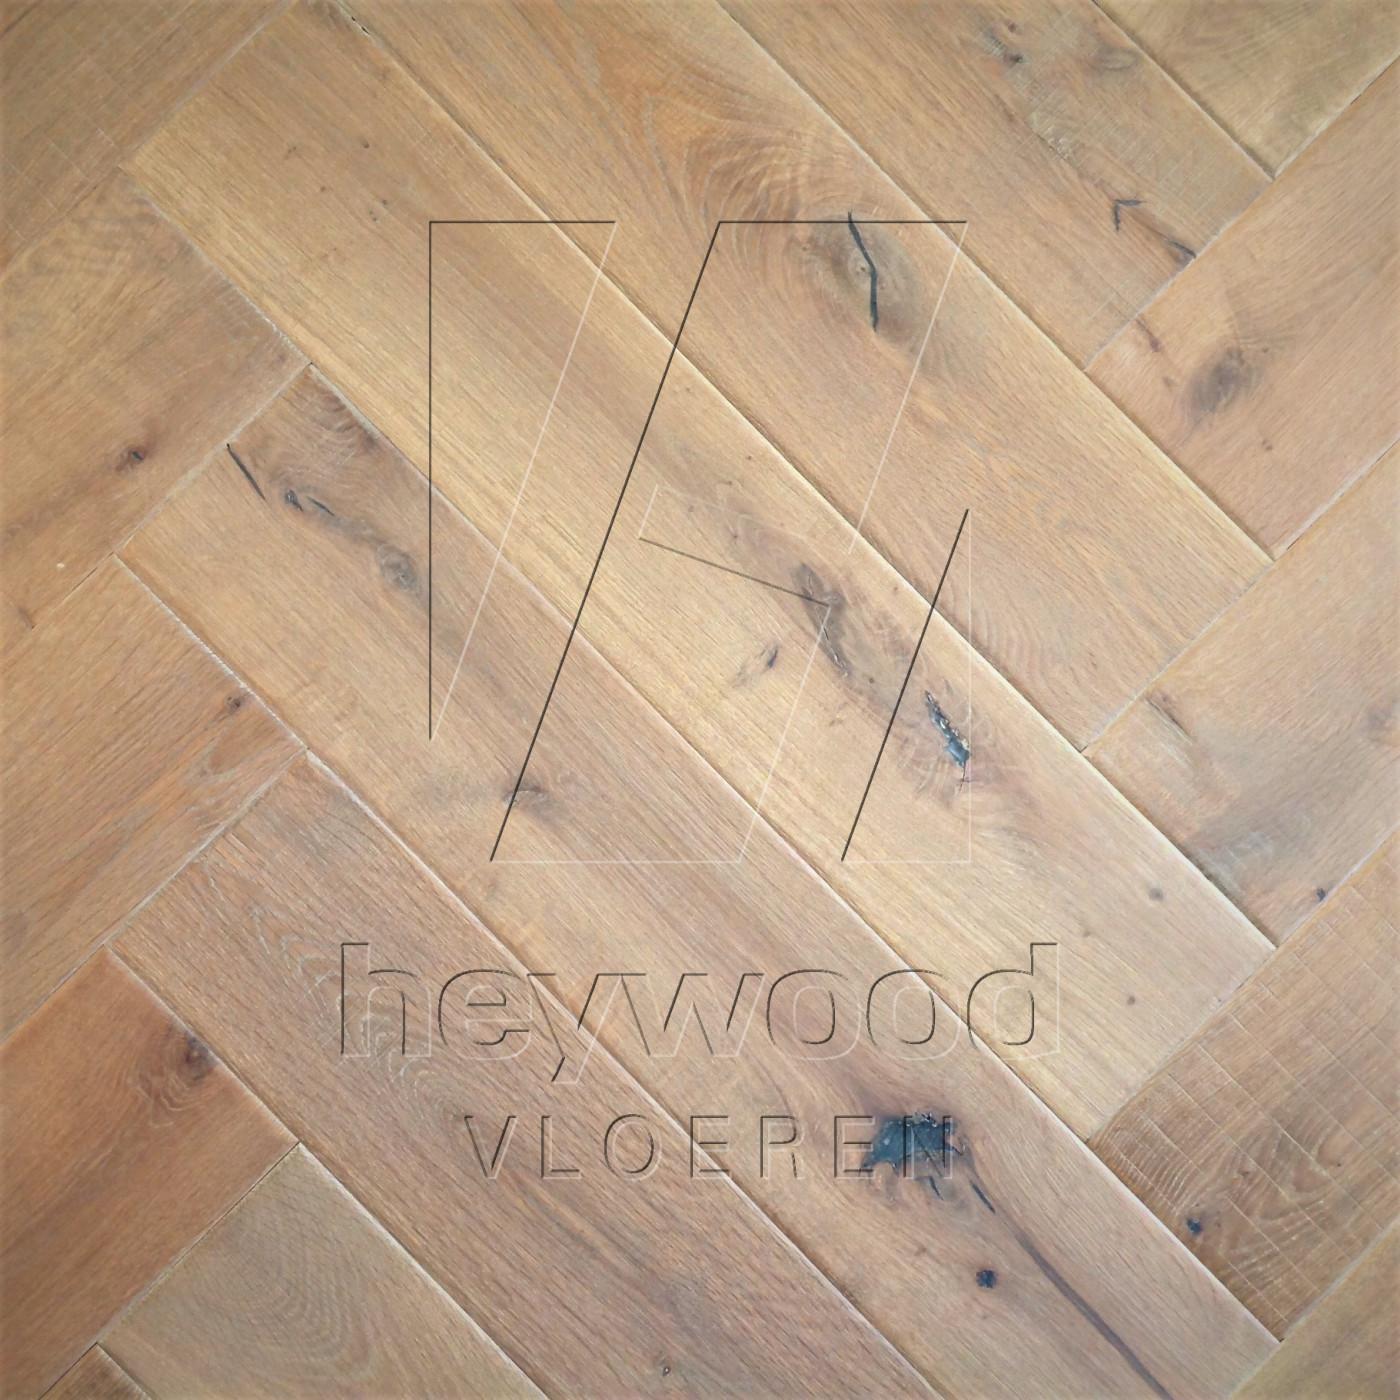 Shrunk Herringbone 'Vanoise' in Herringbone of Pattern & Panel Floors